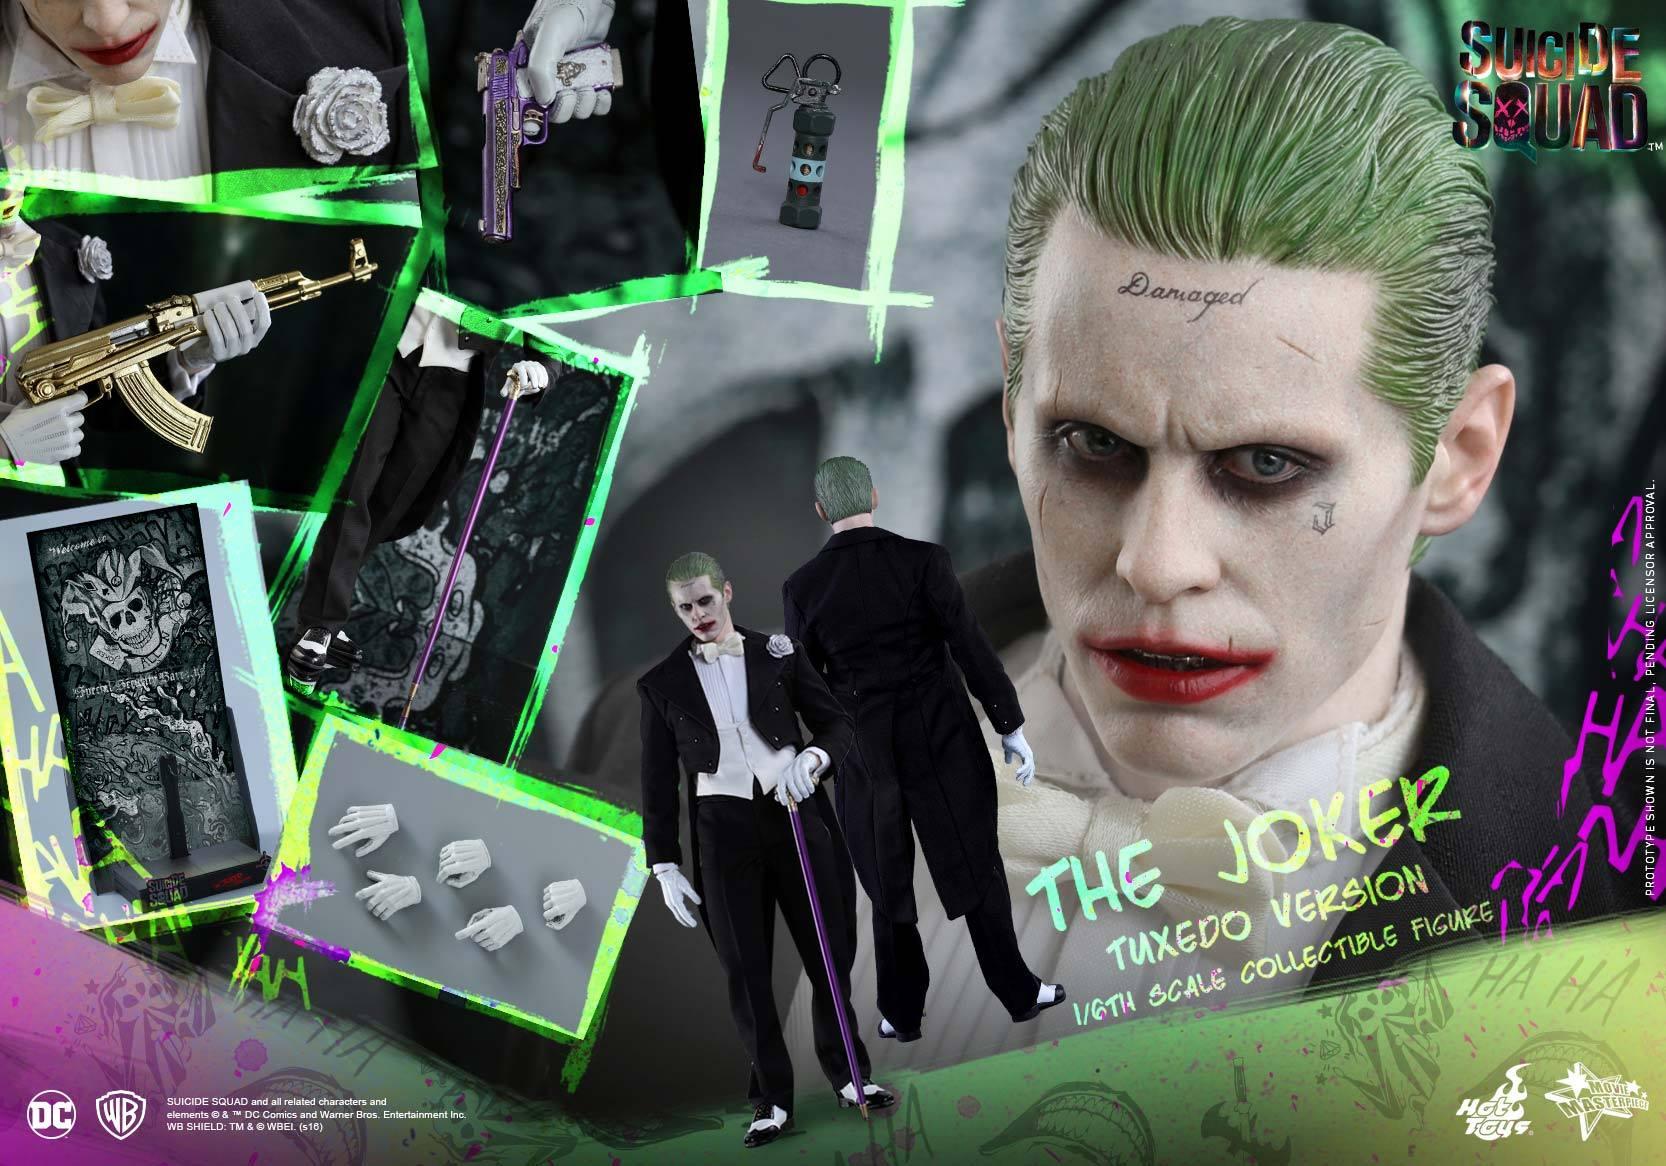 Hot Toys Suicide Squad – The Joker Sixth Scale Figure Tuxedo Version Pre-Orders